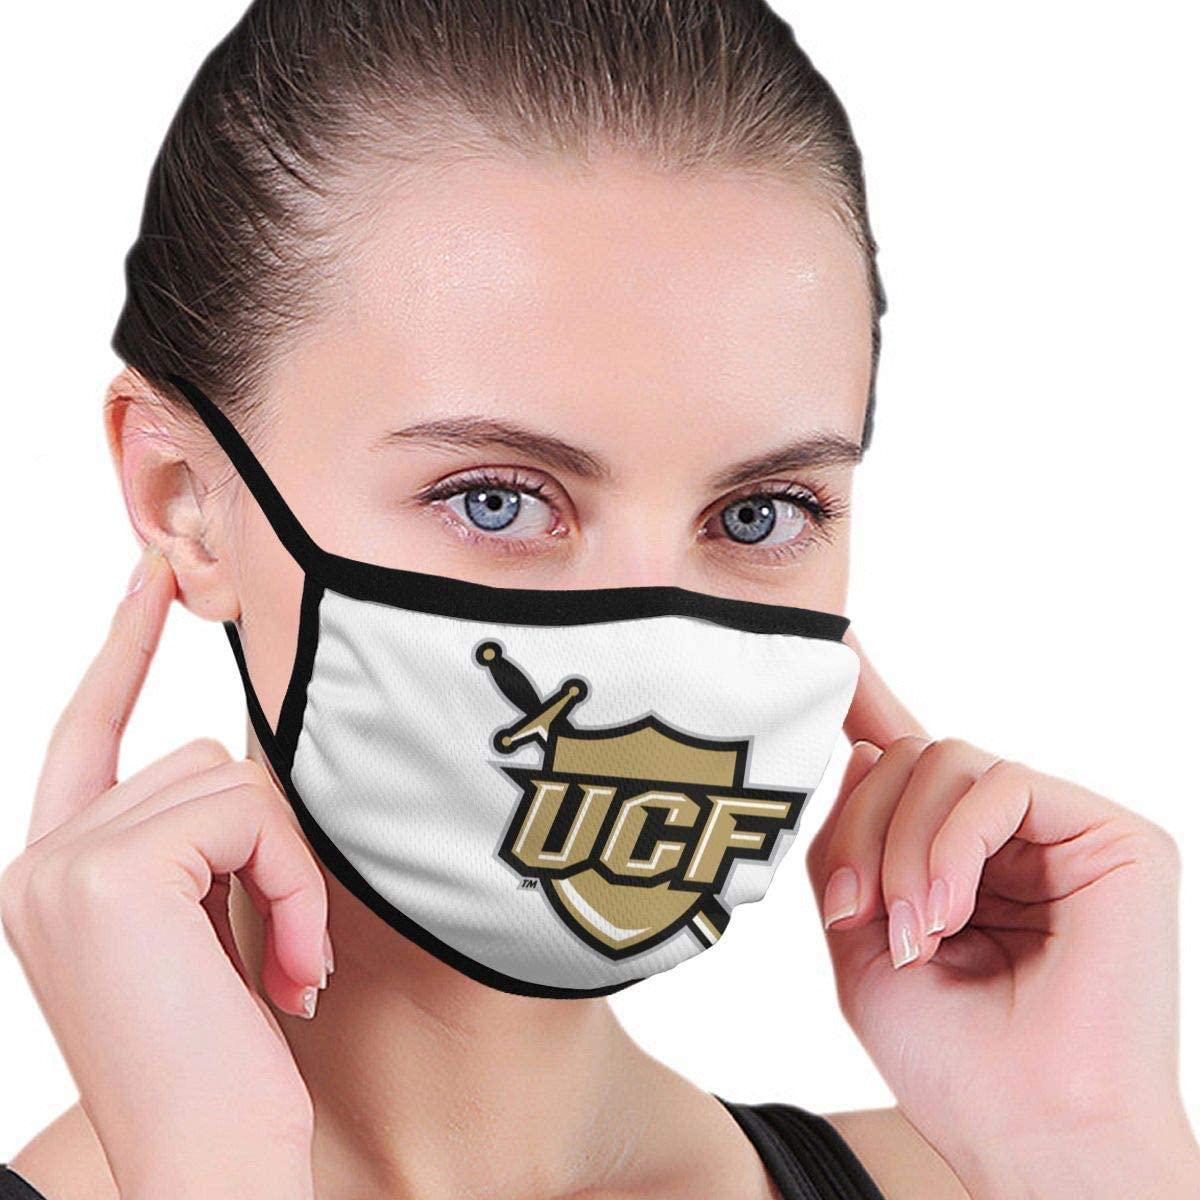 Ucf Outdoor Dy Decorative Face Protection Face Cover Bandana Gaiter Balaclava Scarf Headwear